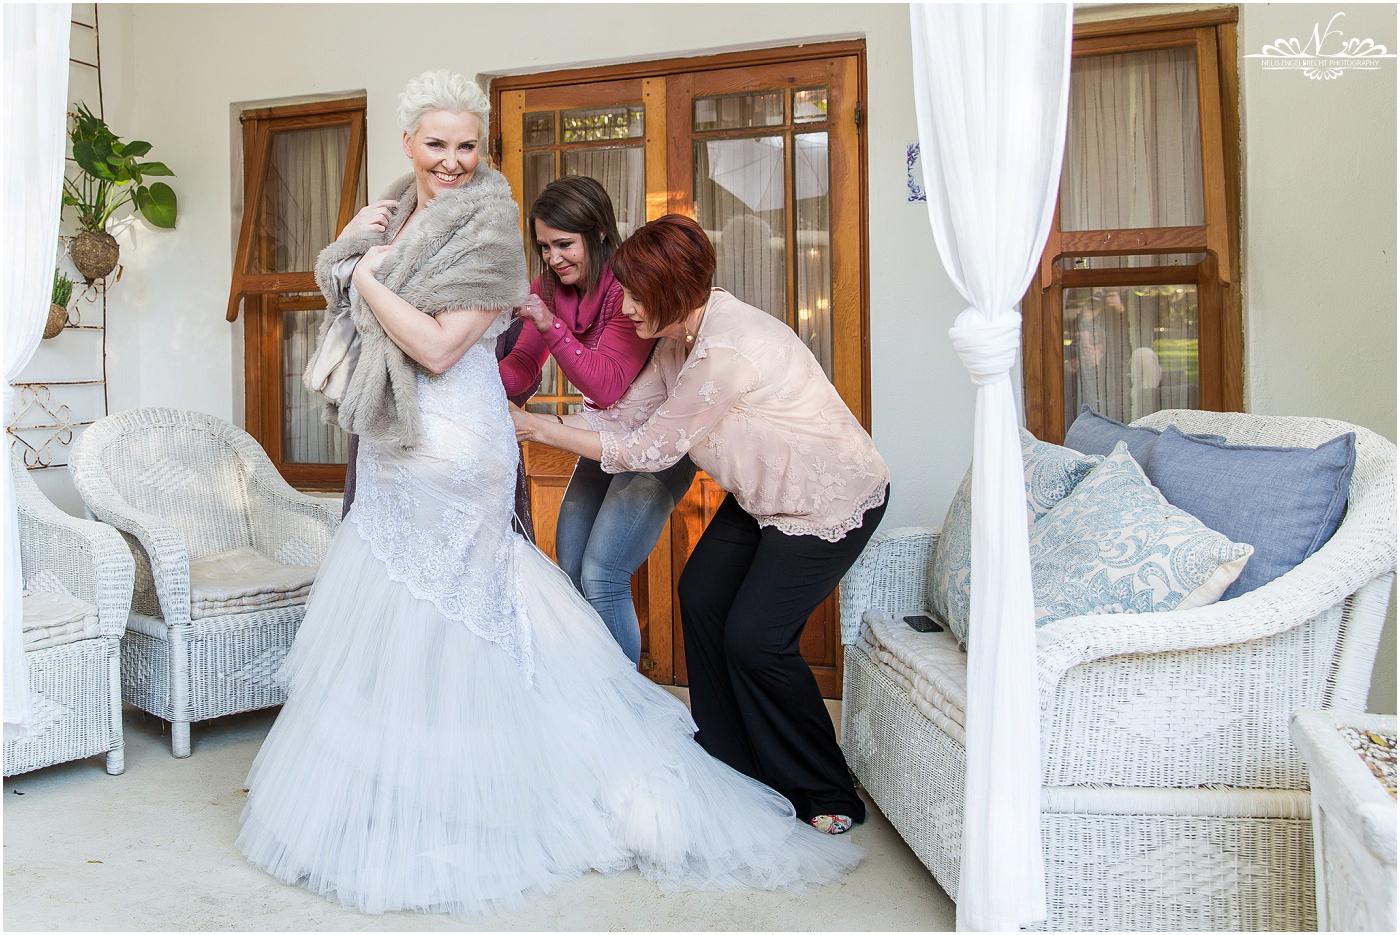 Langkloof-Roses-Wedding-Photos-Nelis-Engelbrecht-Photography-013